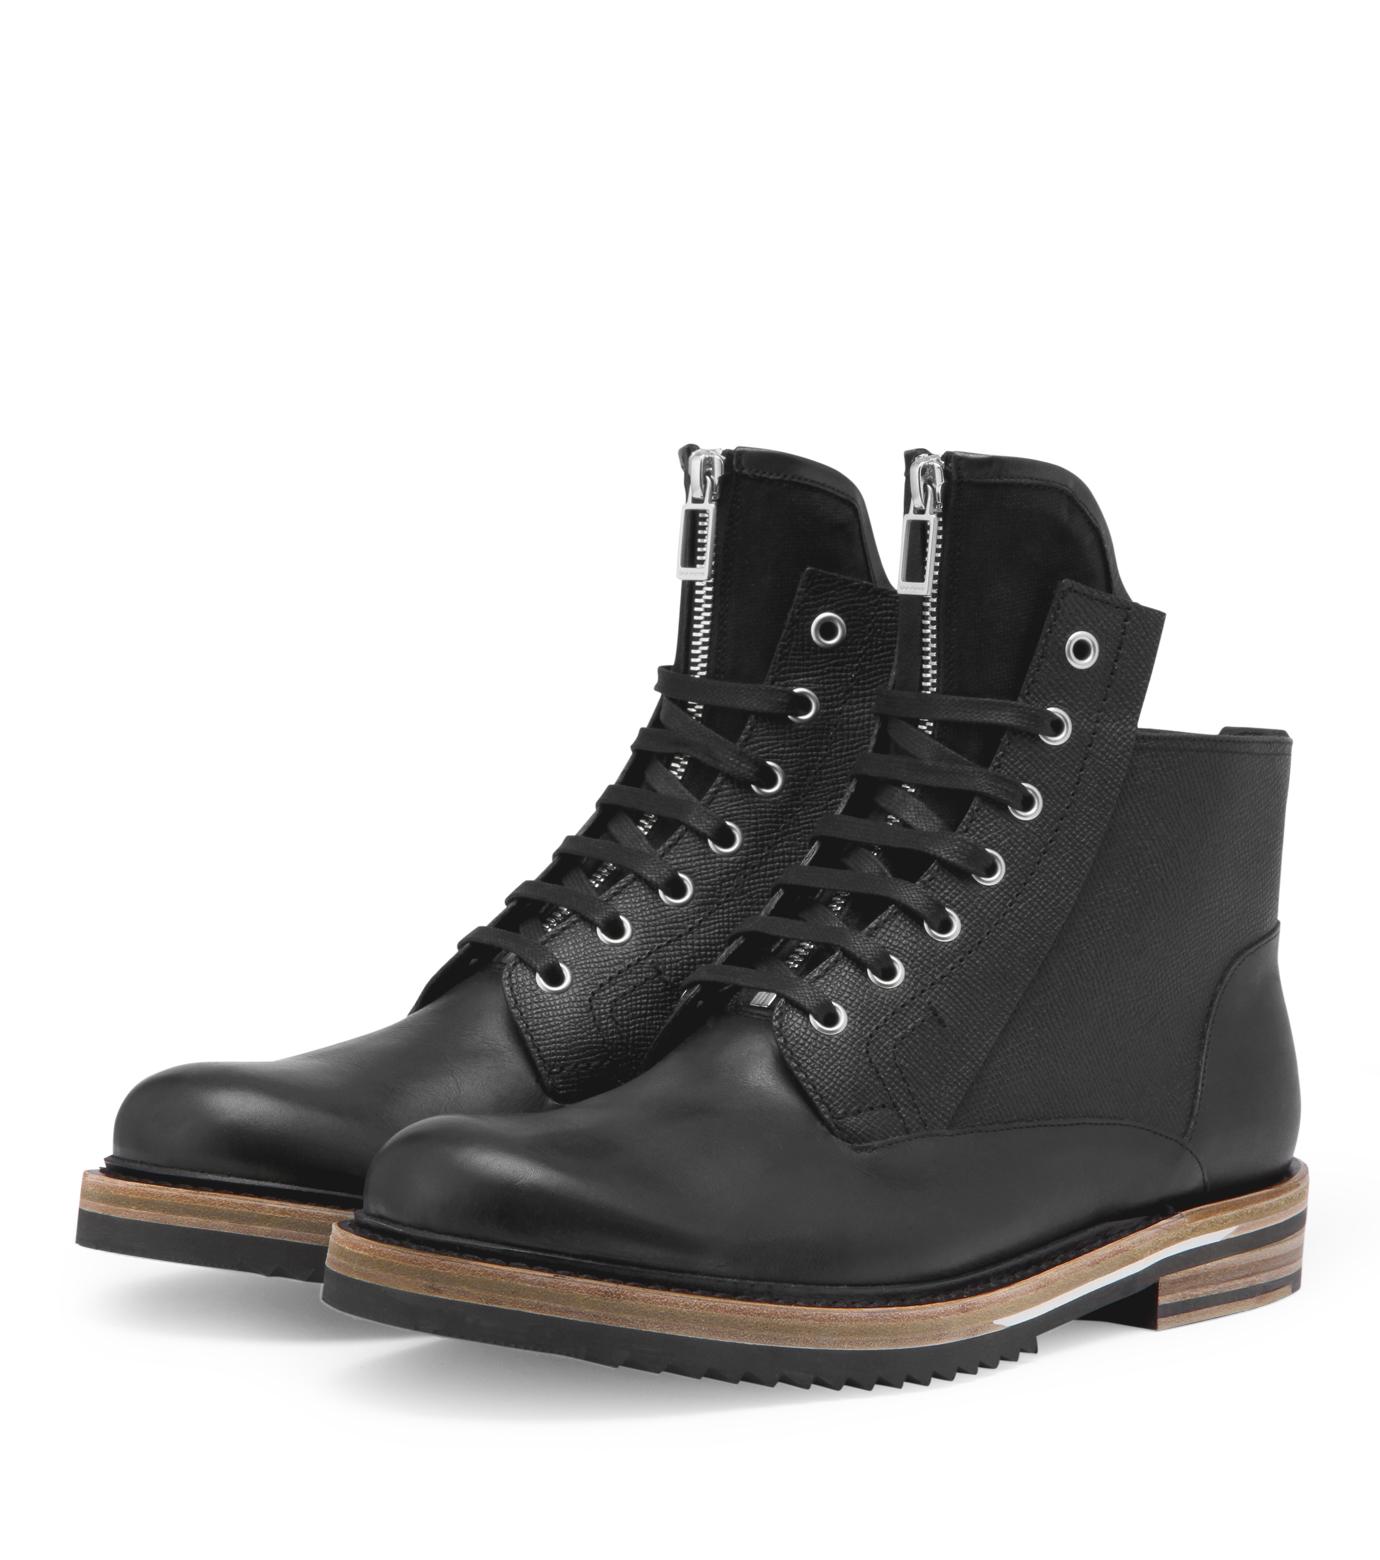 Dior Homme(ディオール オム)のCollection boots-BLACK-3BO080VDZ-13 拡大詳細画像4